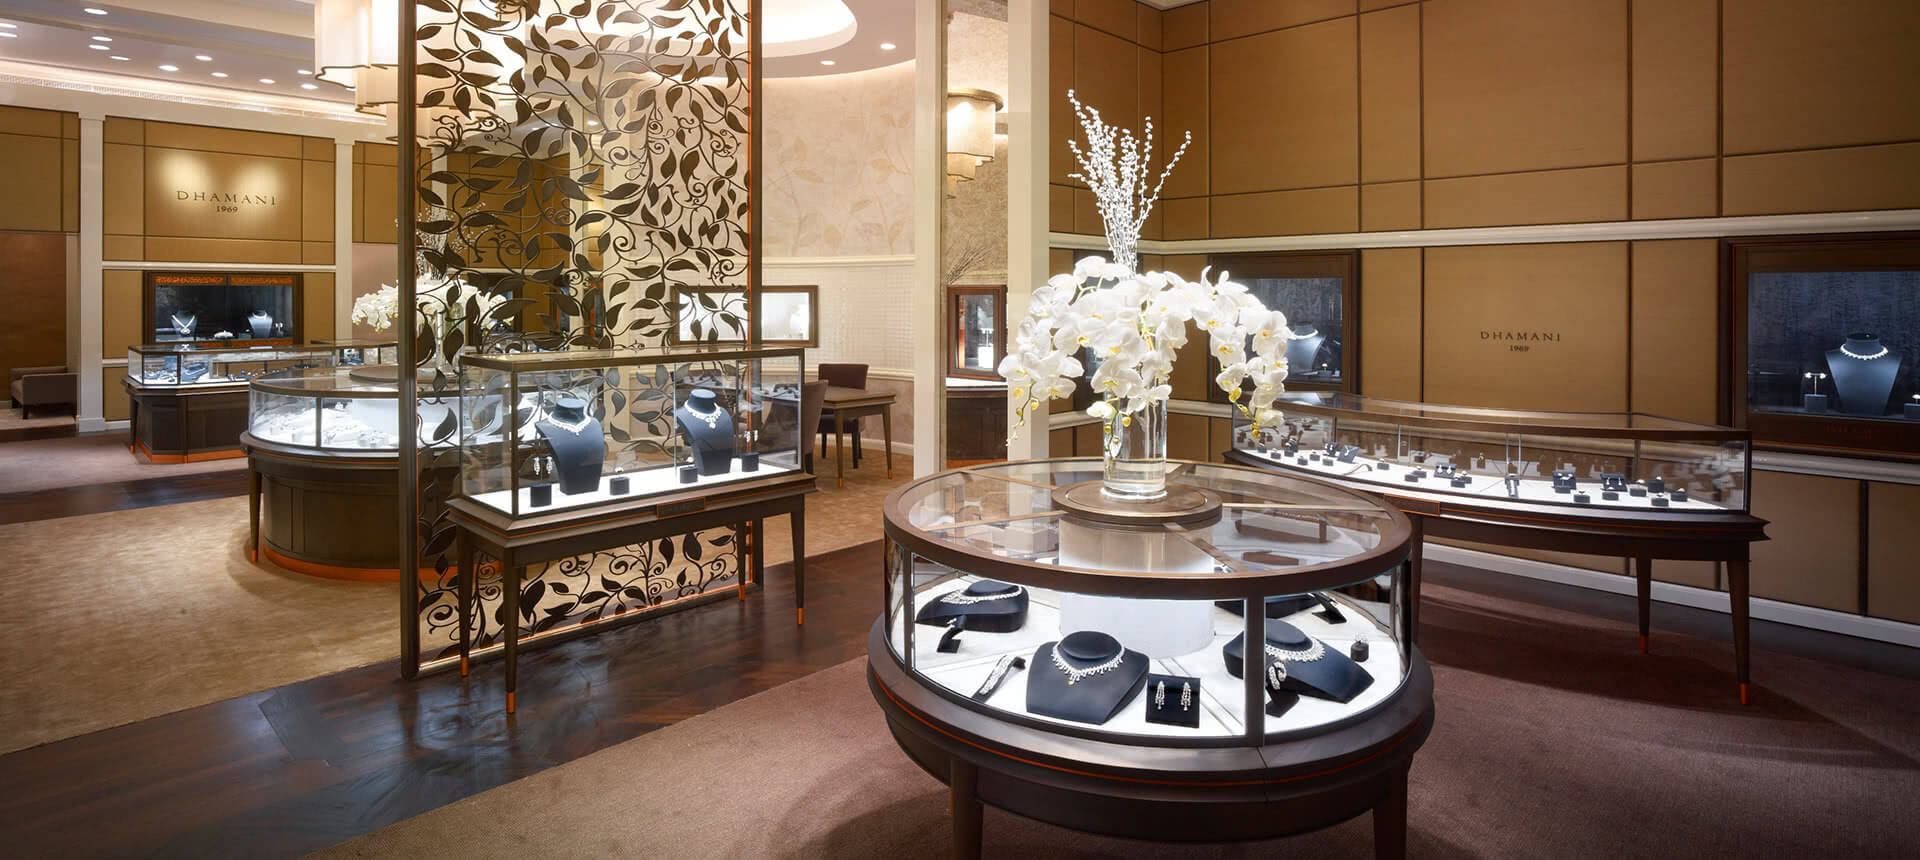 Luxury Life Design Best Wedding Locations In The World: CallisonRTKL